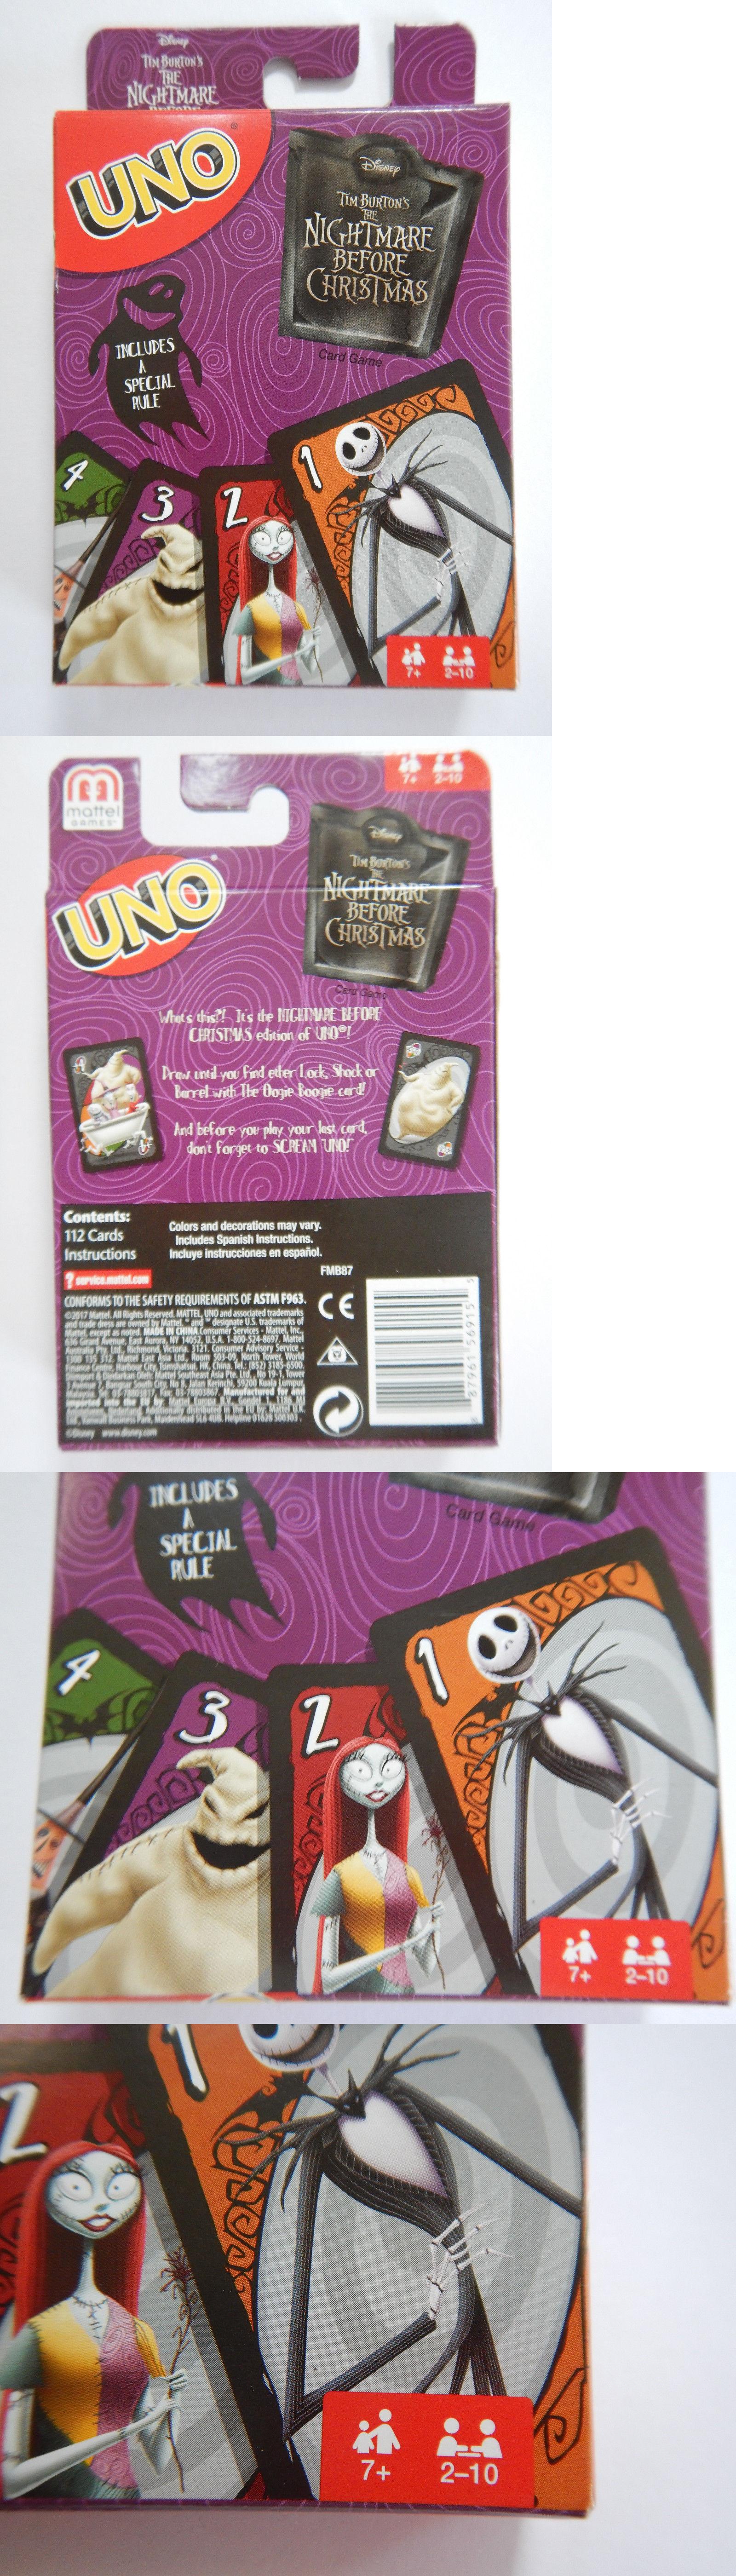 Nightmare Before Christmas 36586: Nightmare Before Christmas Uno ...